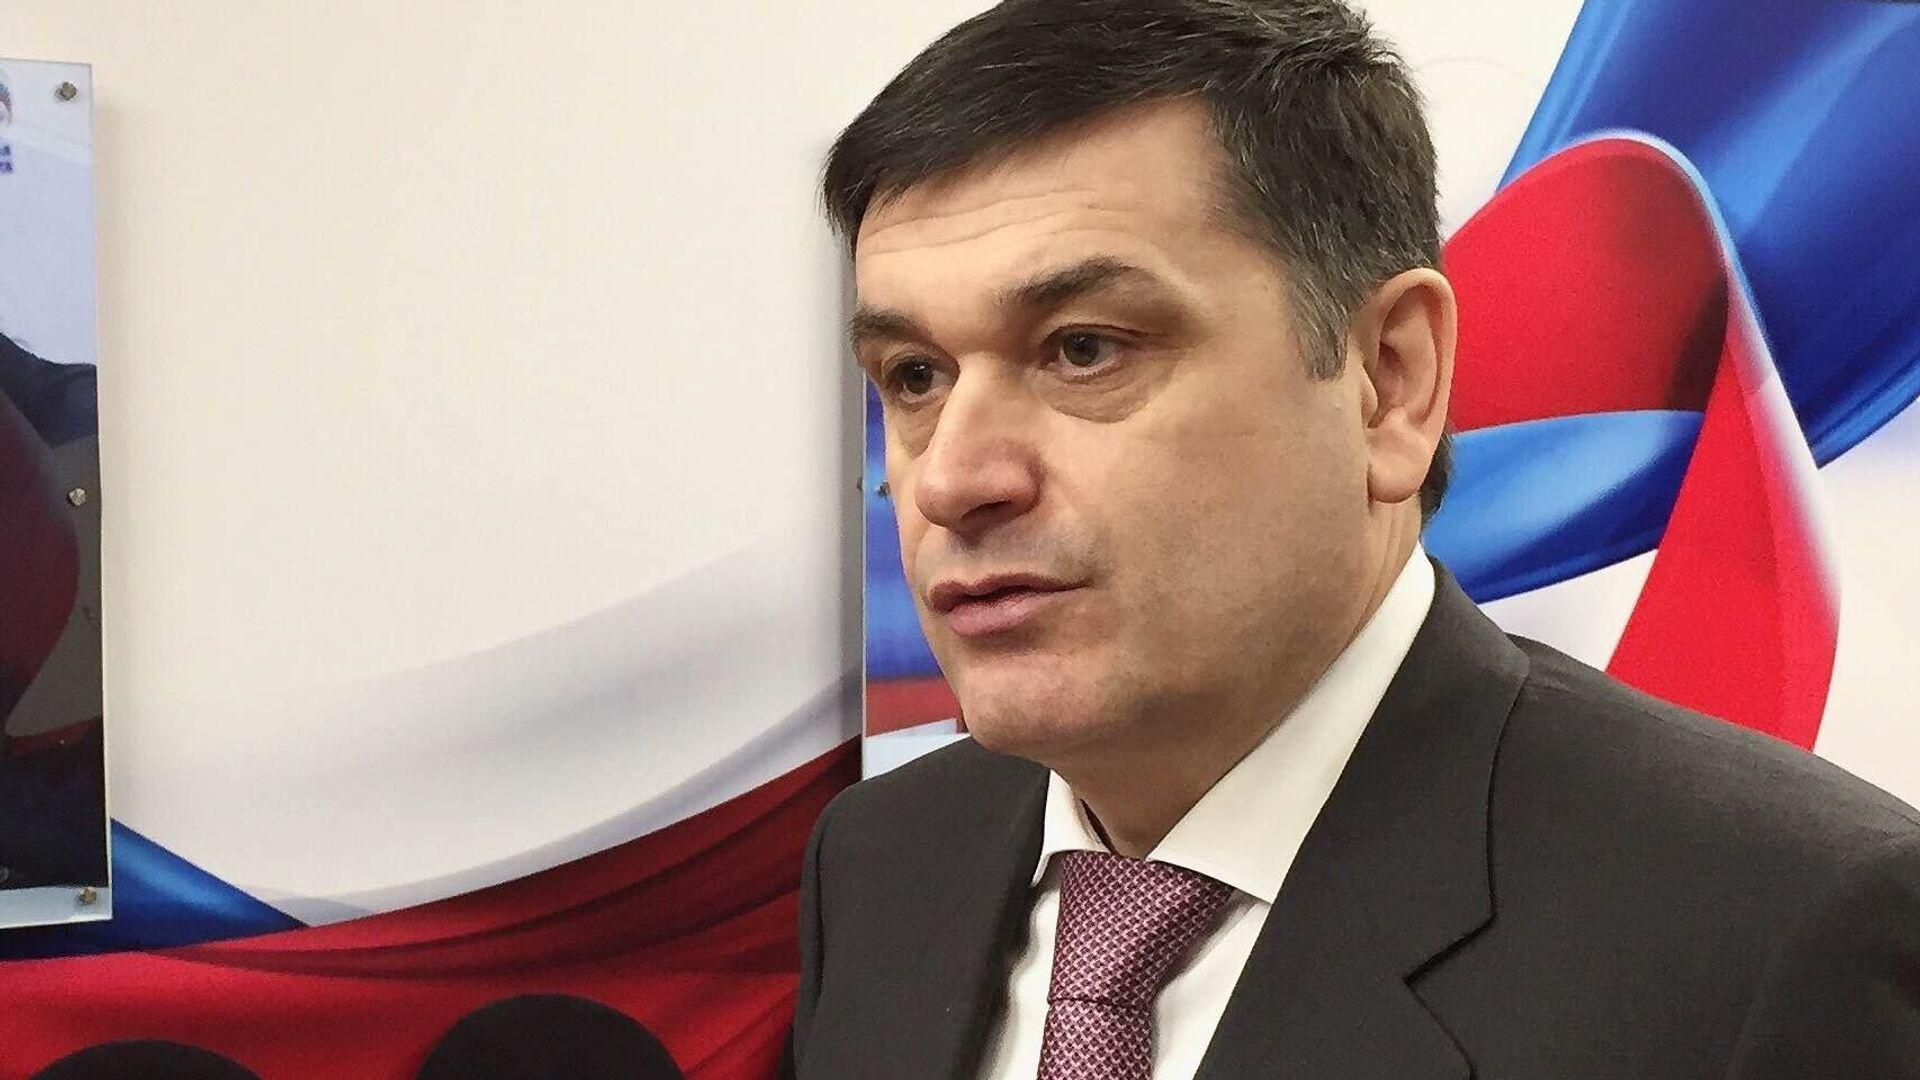 В Совфеде прокомментировали прогноз Суркова об исчезновении парламента